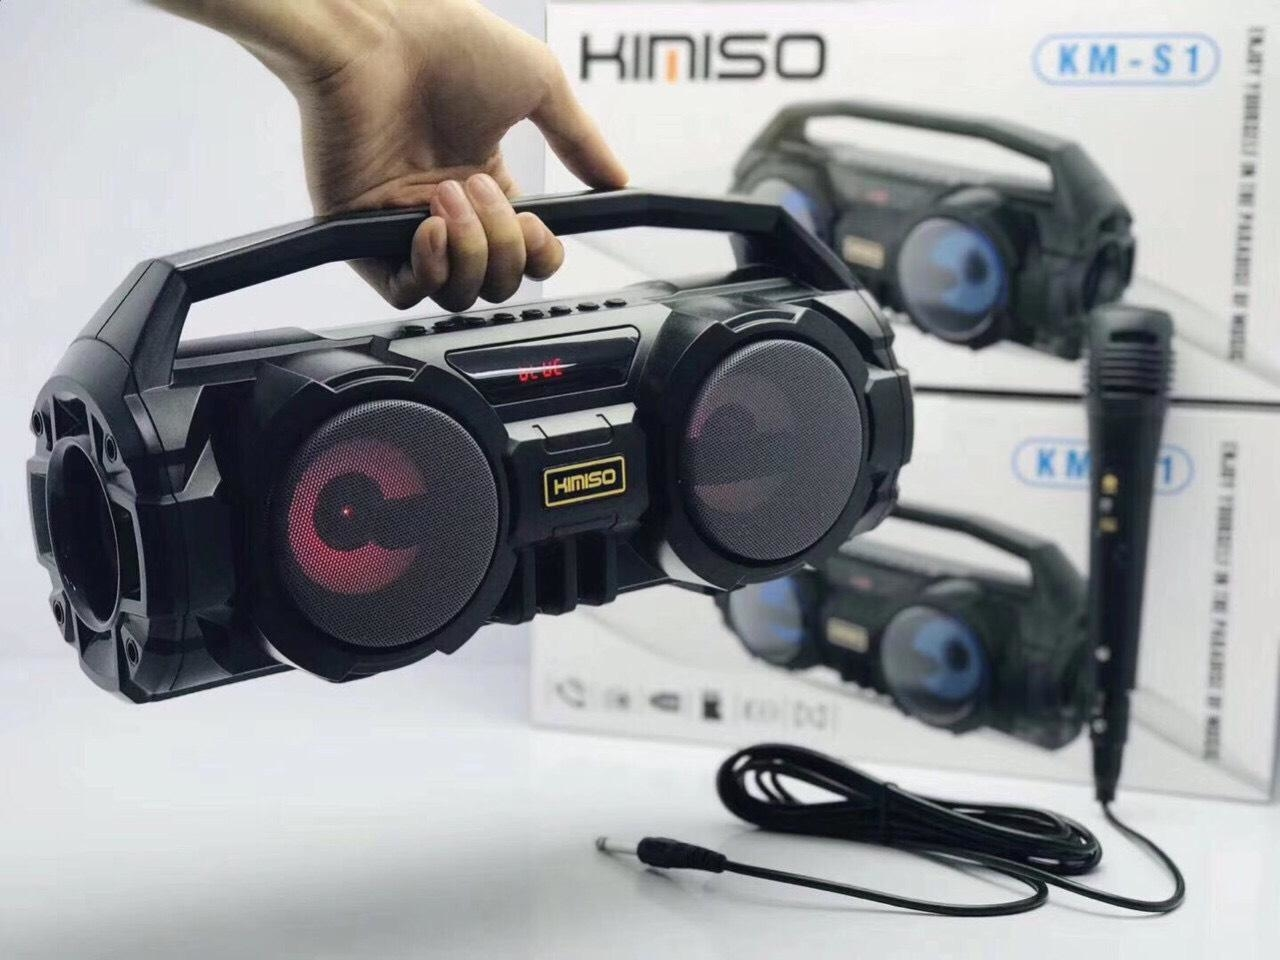 Loa Bluetooth Karaoke KIMISO S1/S2 - Tặng kèm 01 Micro